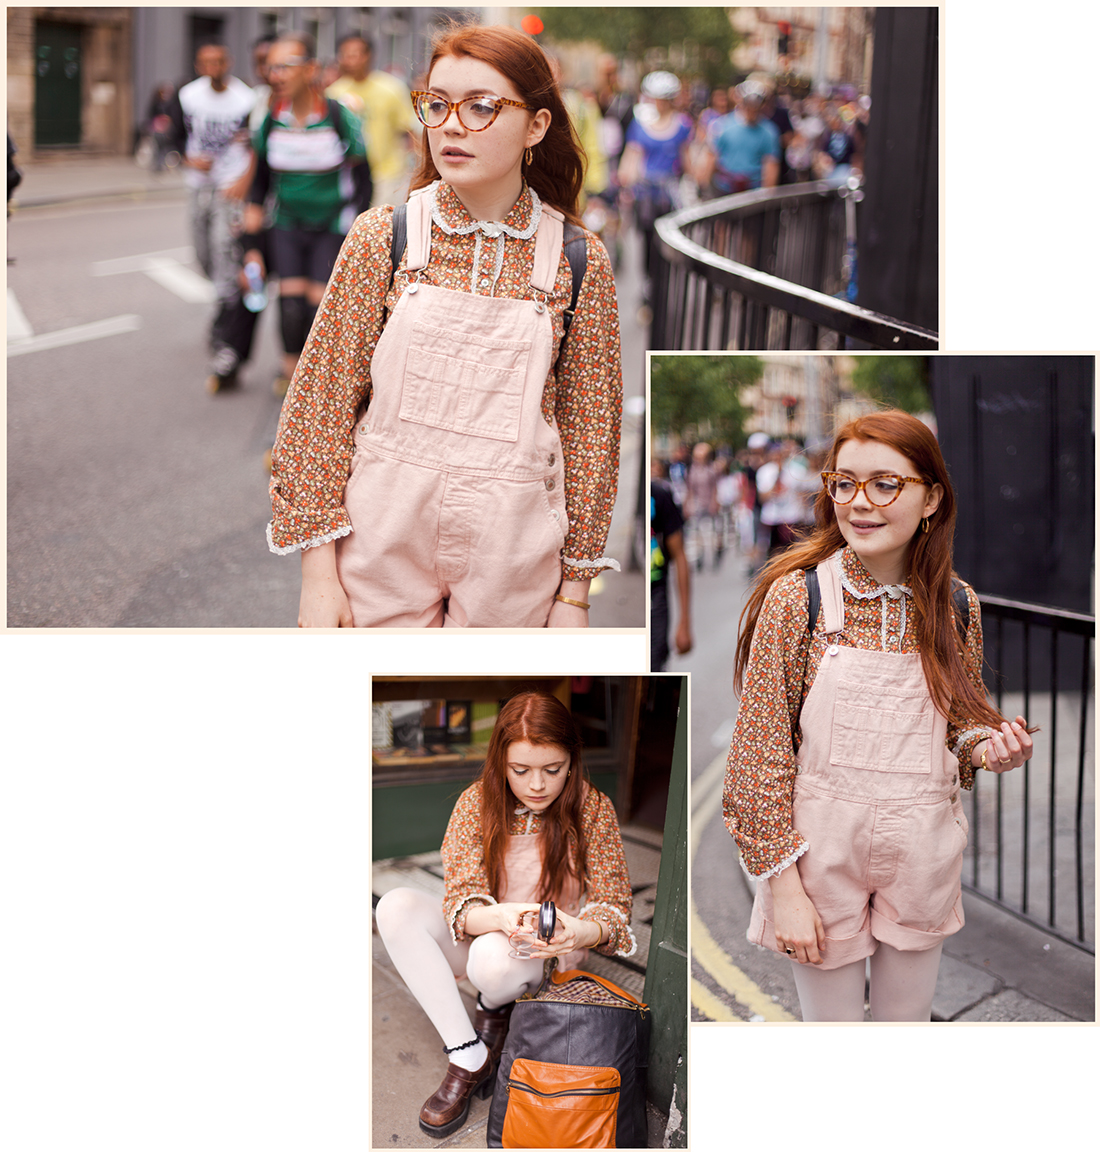 Fashion photoshoot behind the scenes by London based photographer Ailera Stone.